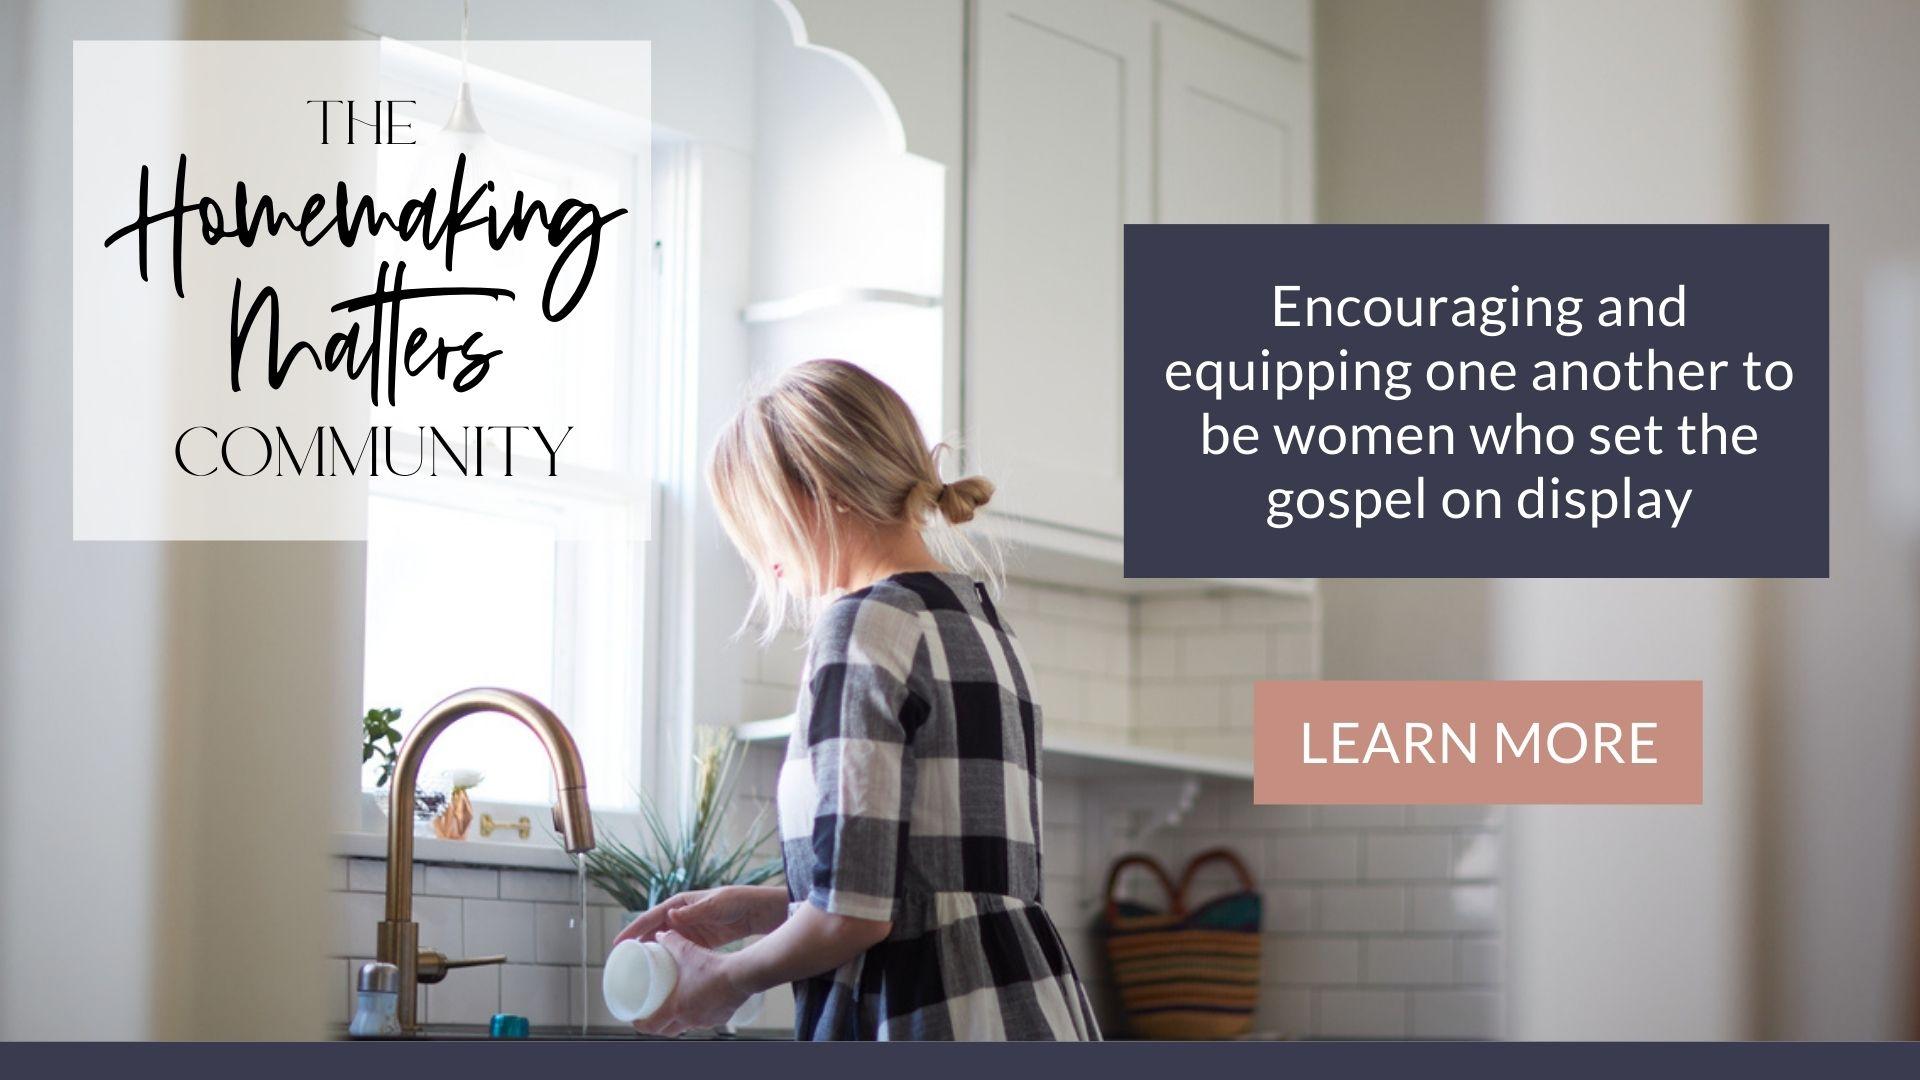 Homemaking Matters Community @thankfulhomemaker